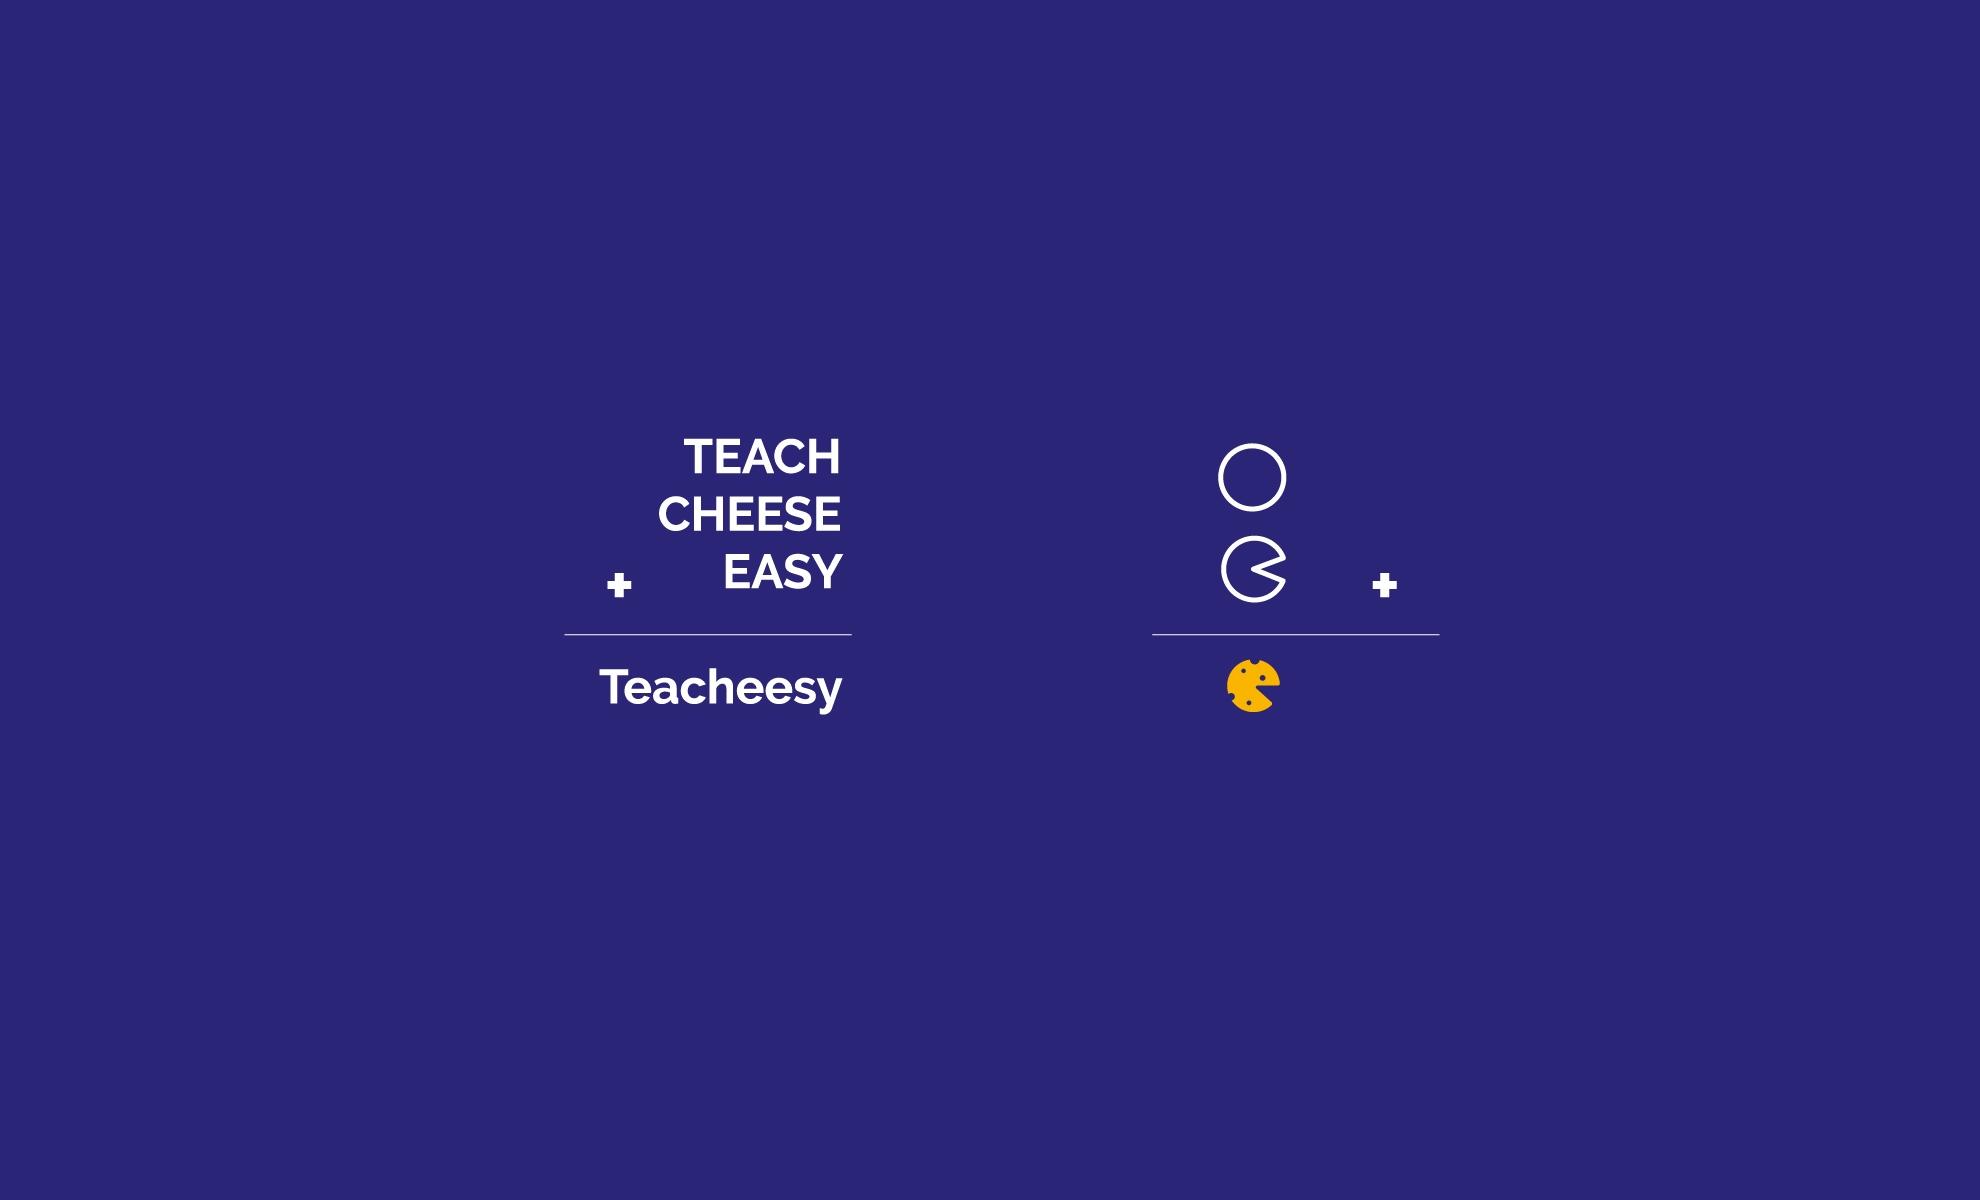 Conceptualización de formas para el plan de formación europeo Theacheesy